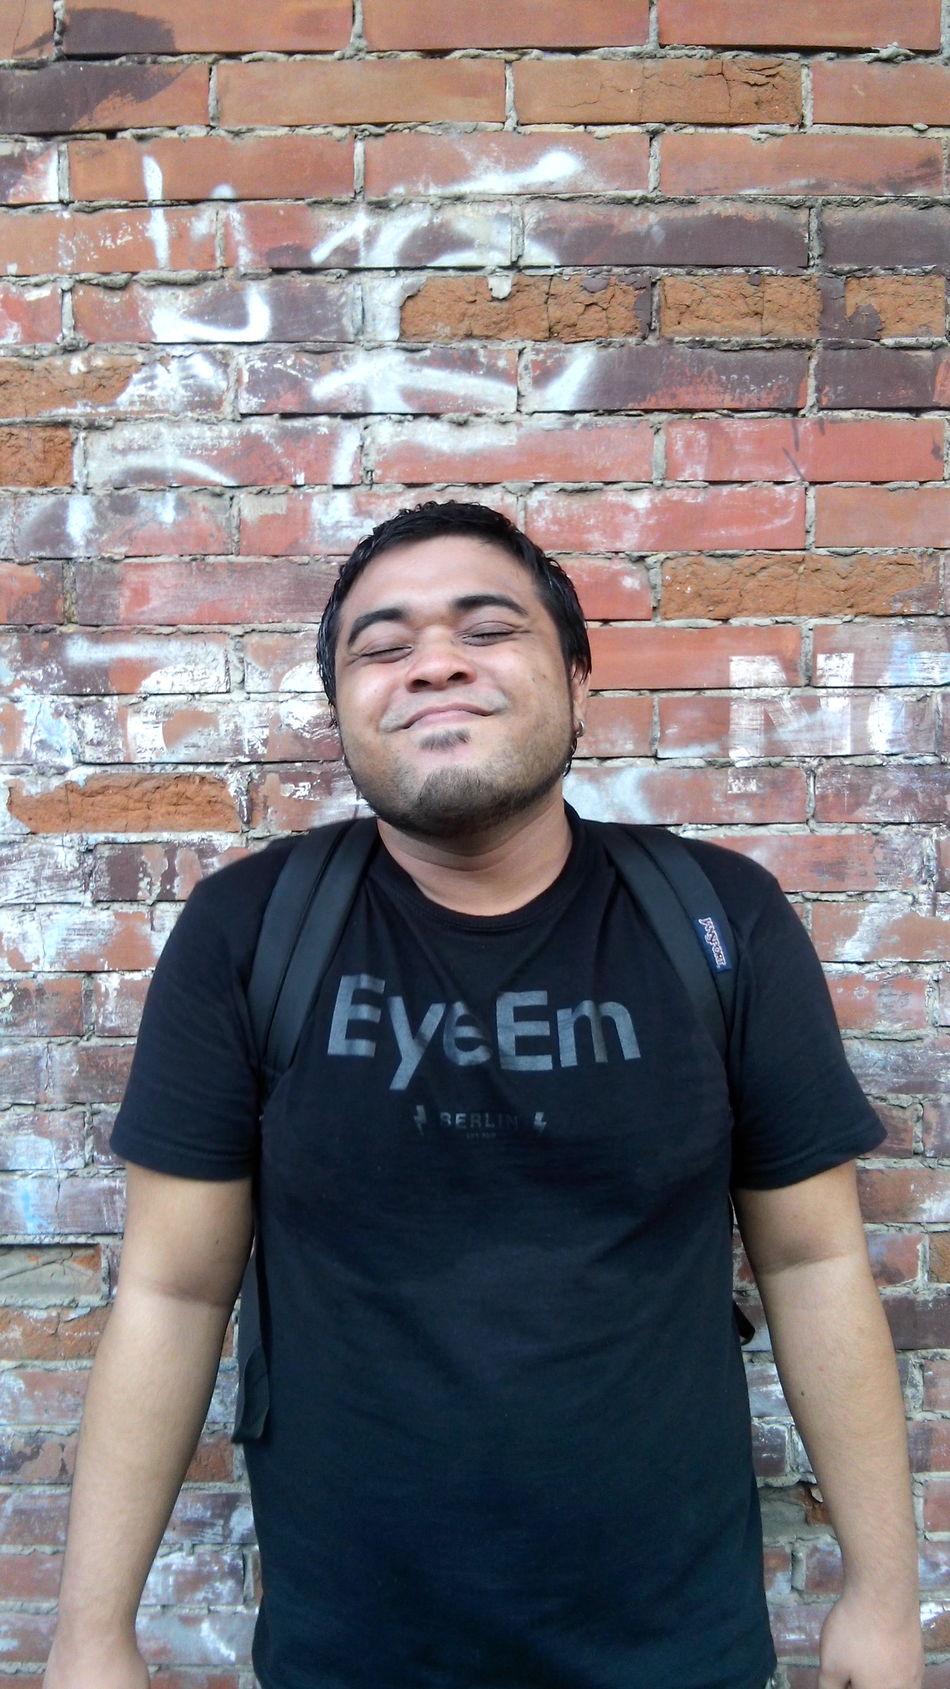 Eyeem Philippines Shoot, Share, Learn - EyeEm Cagayan De Oro Meetup